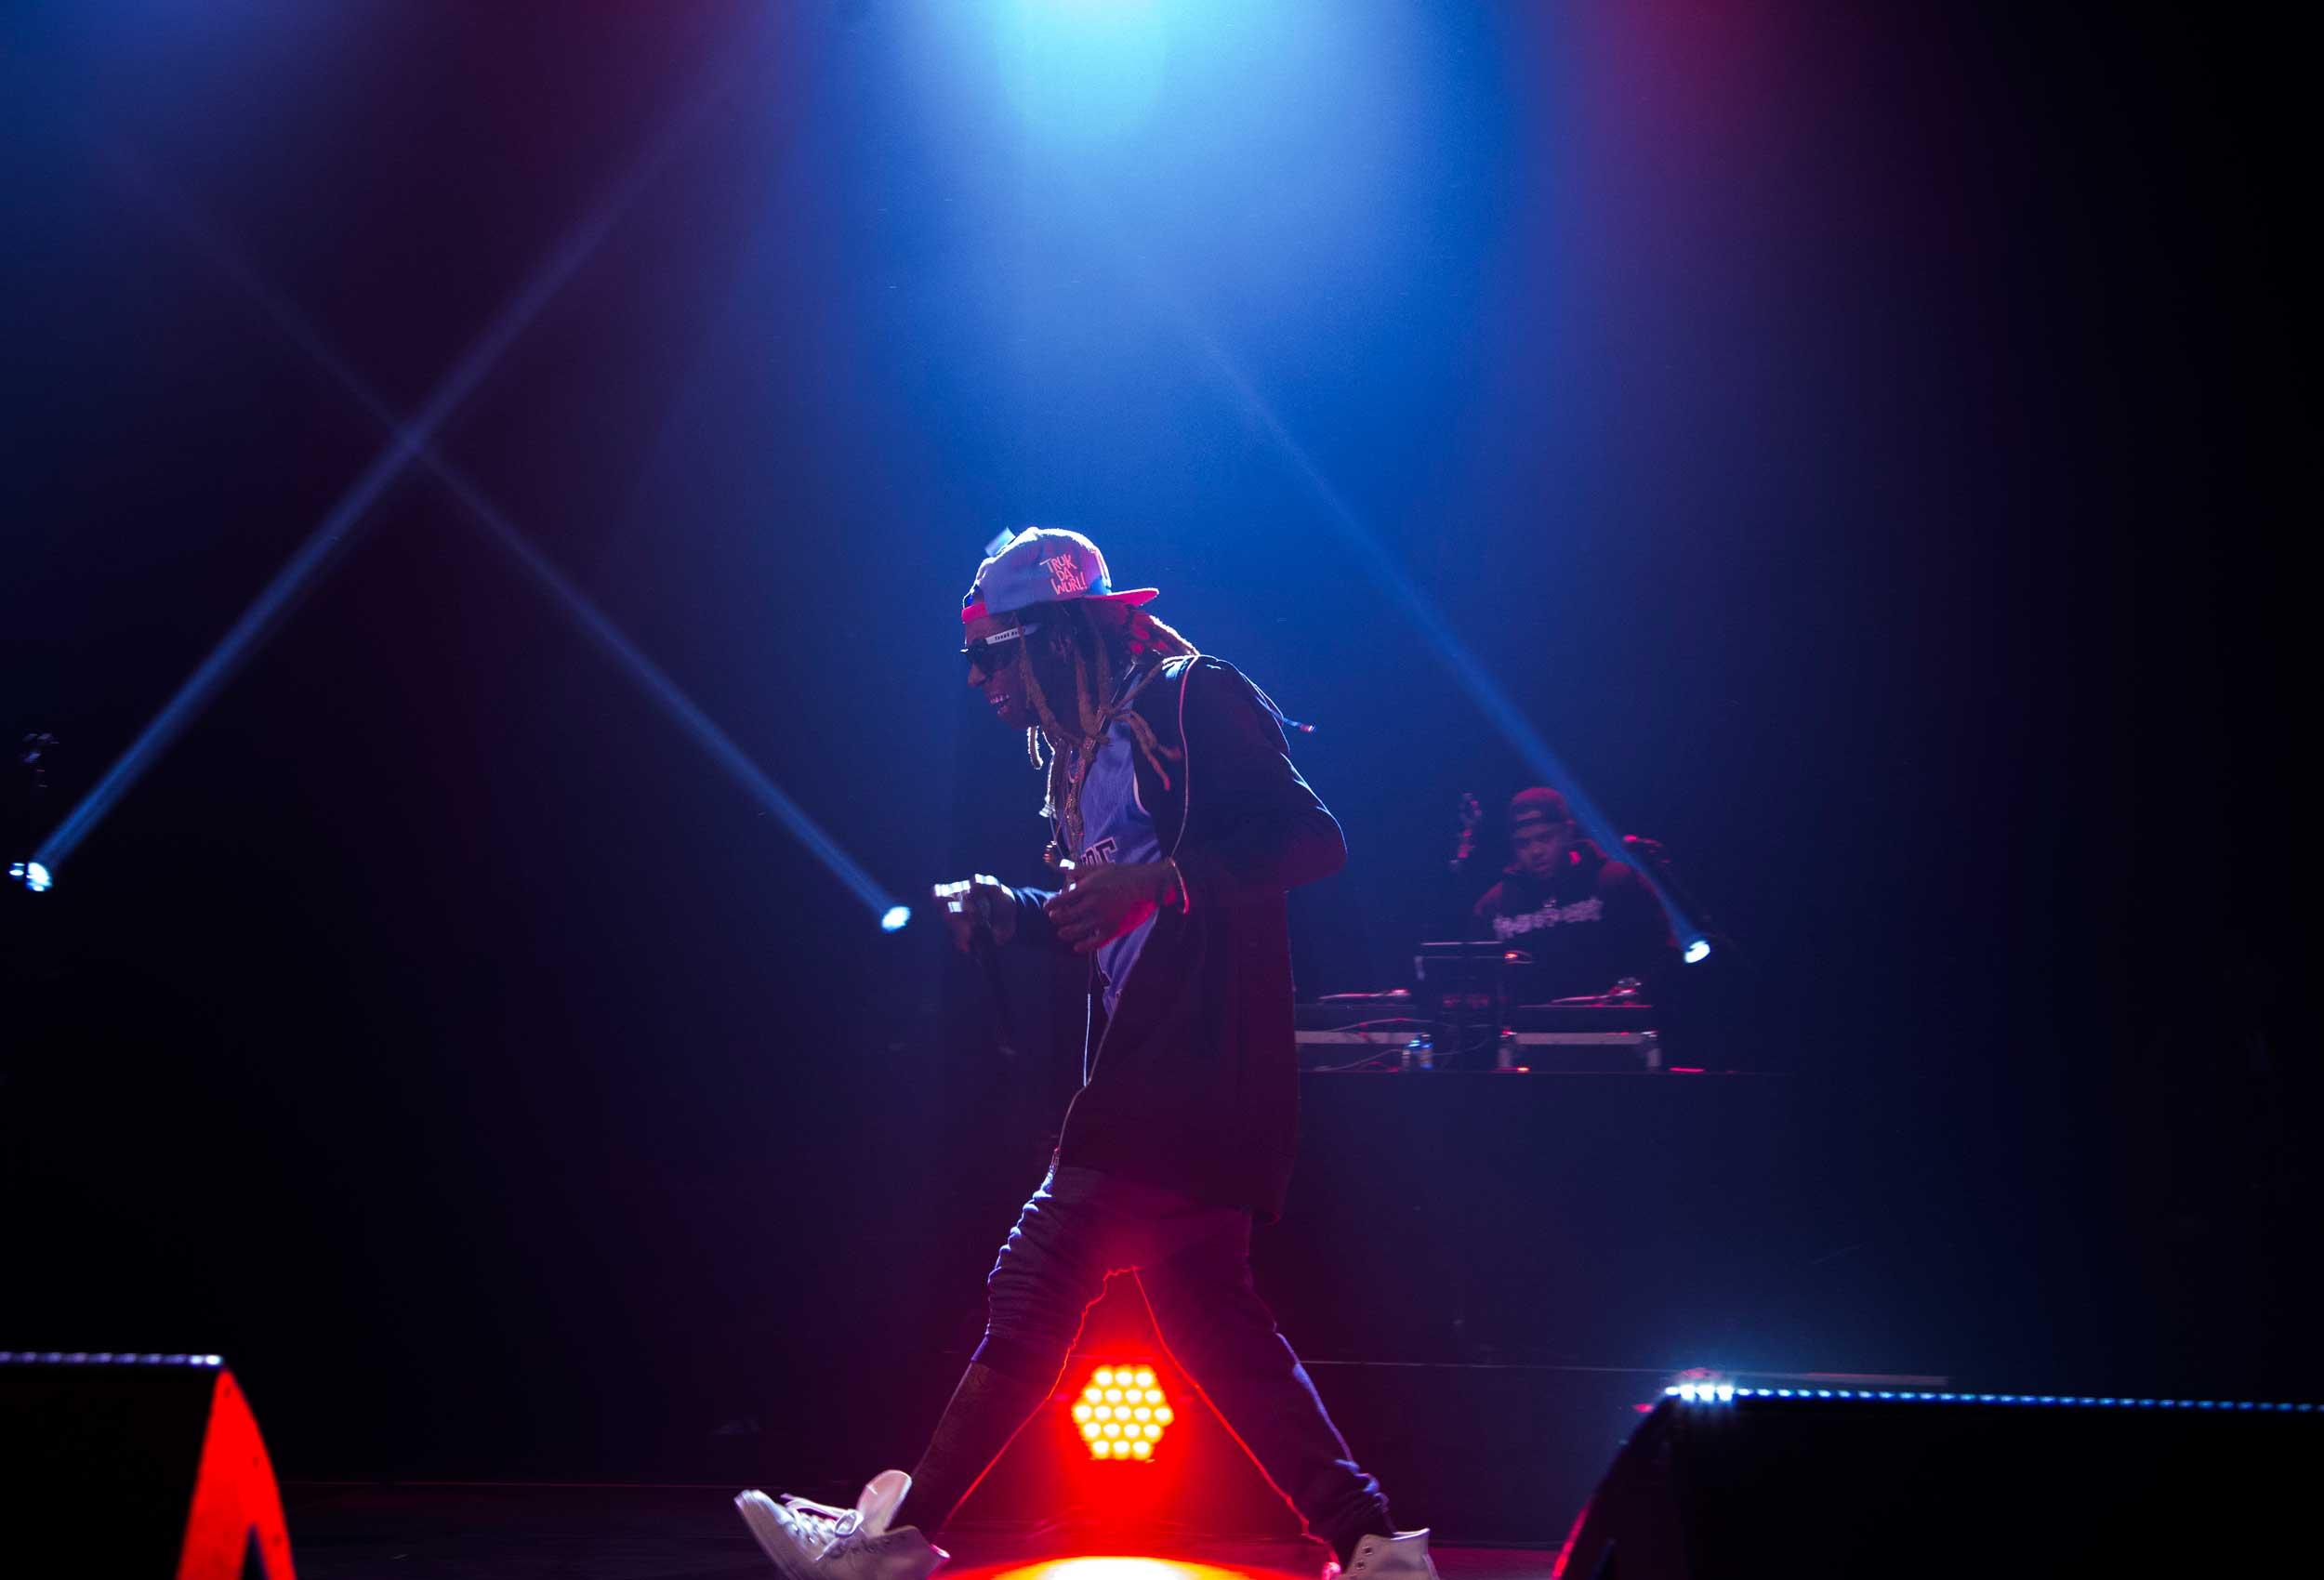 Lil Wayne at the Ryan Center